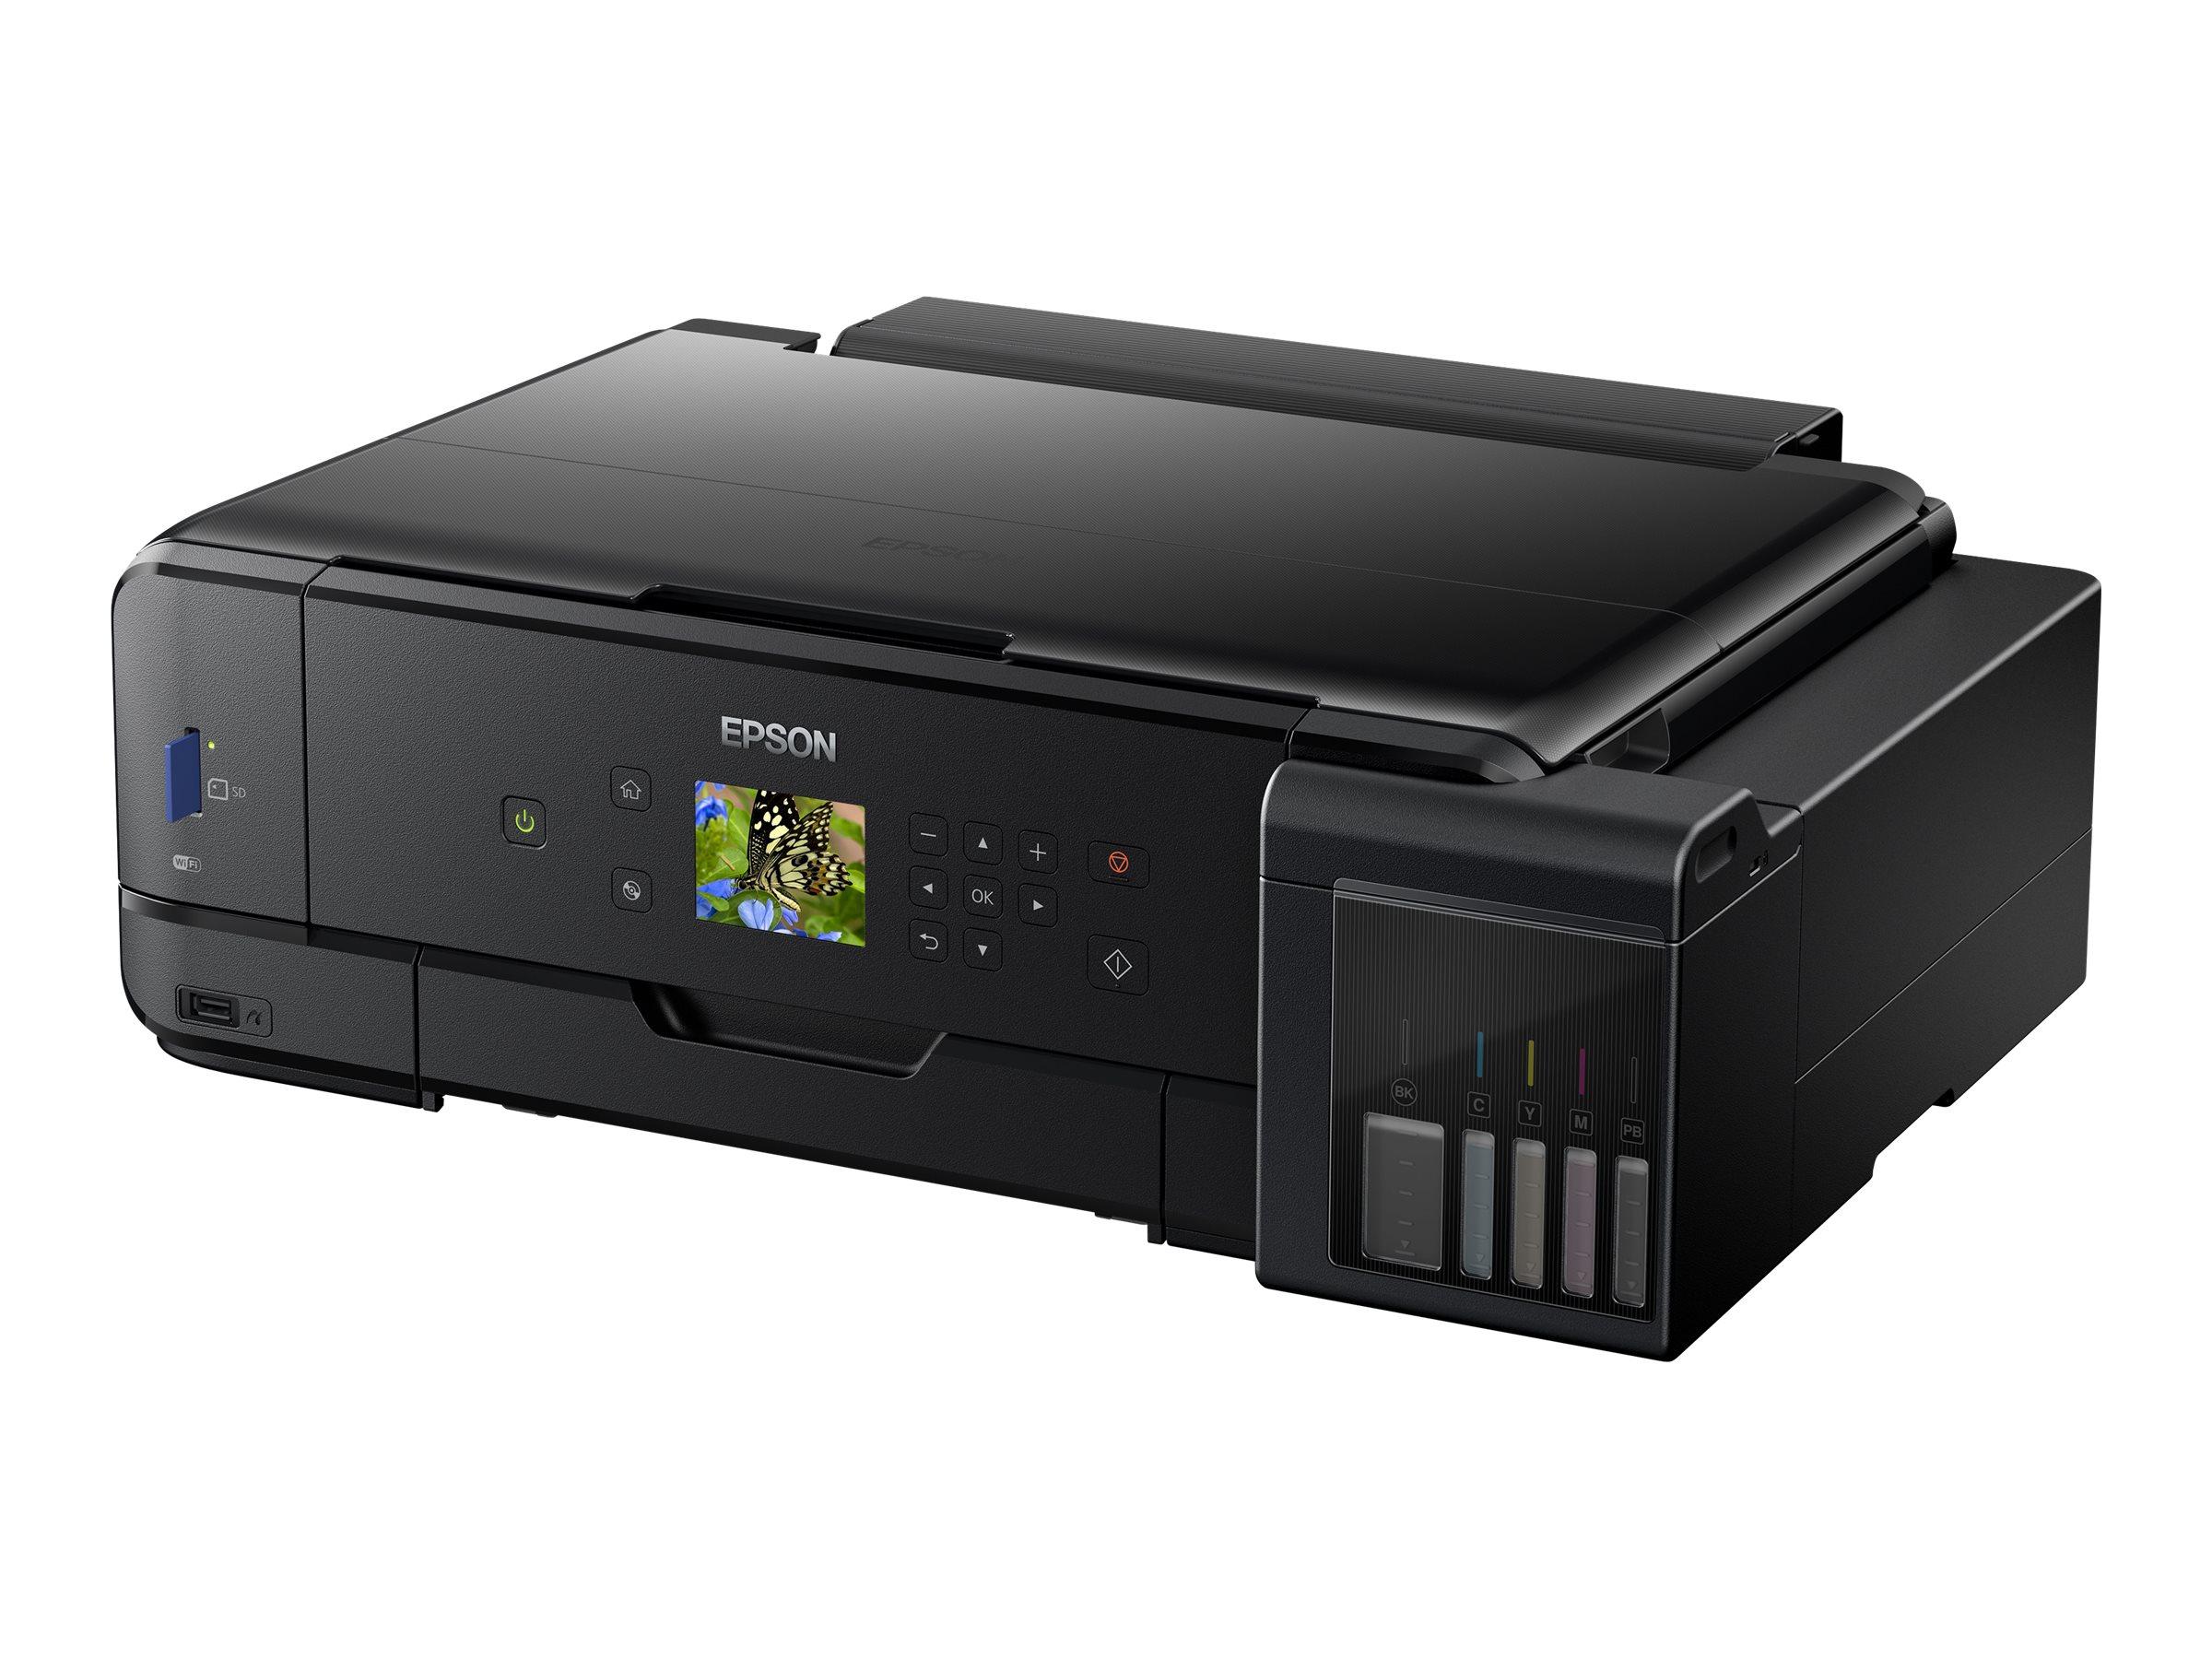 Epson EcoTank ET-7750 - Multifunktionsdrucker - Farbe - Tintenstrahl - Letter A (216 x 279 mm)/A4 (210 x 297 mm) (Original) - A3